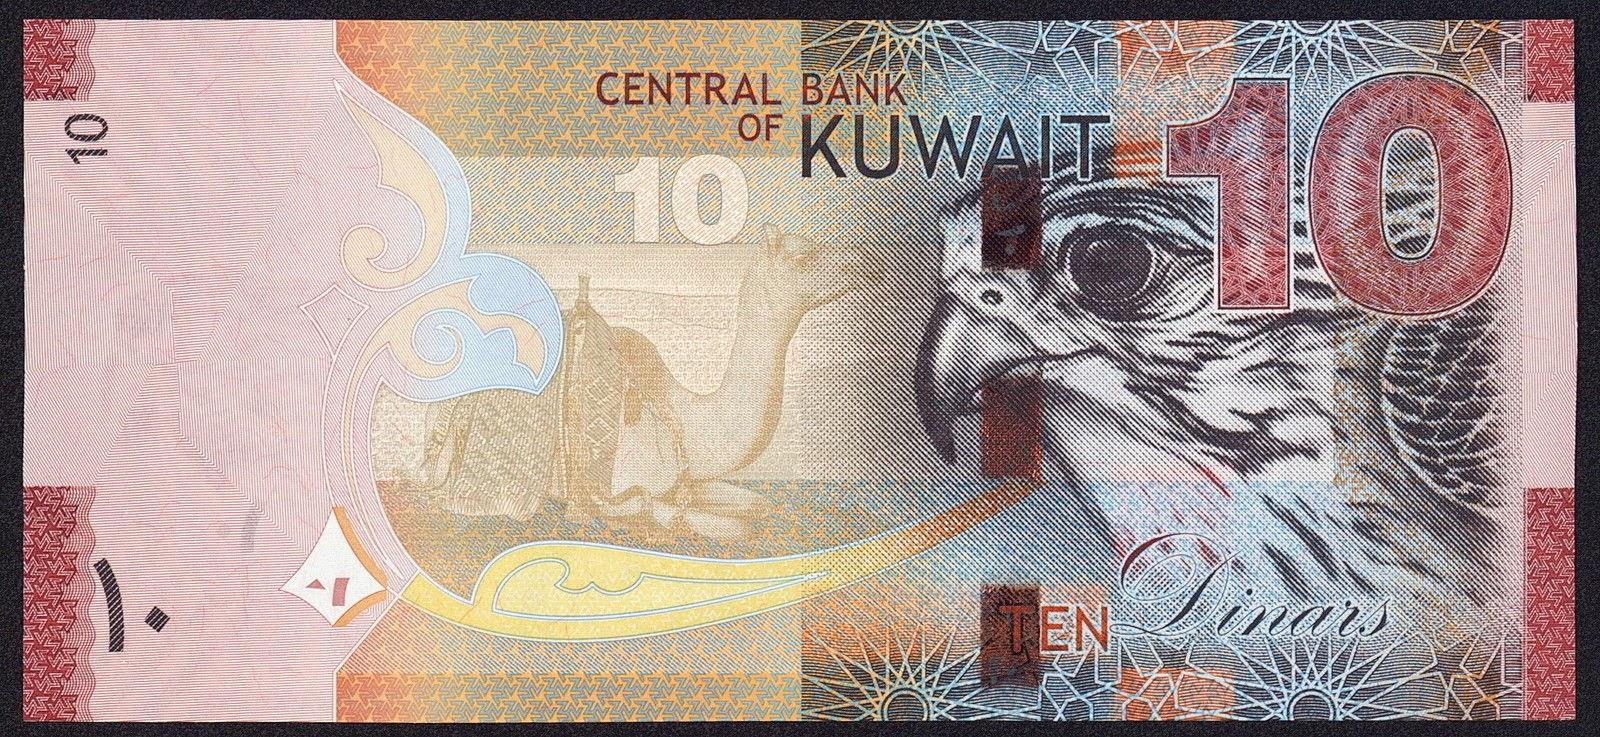 Kuwait money currency 10 Dinars banknote 2014